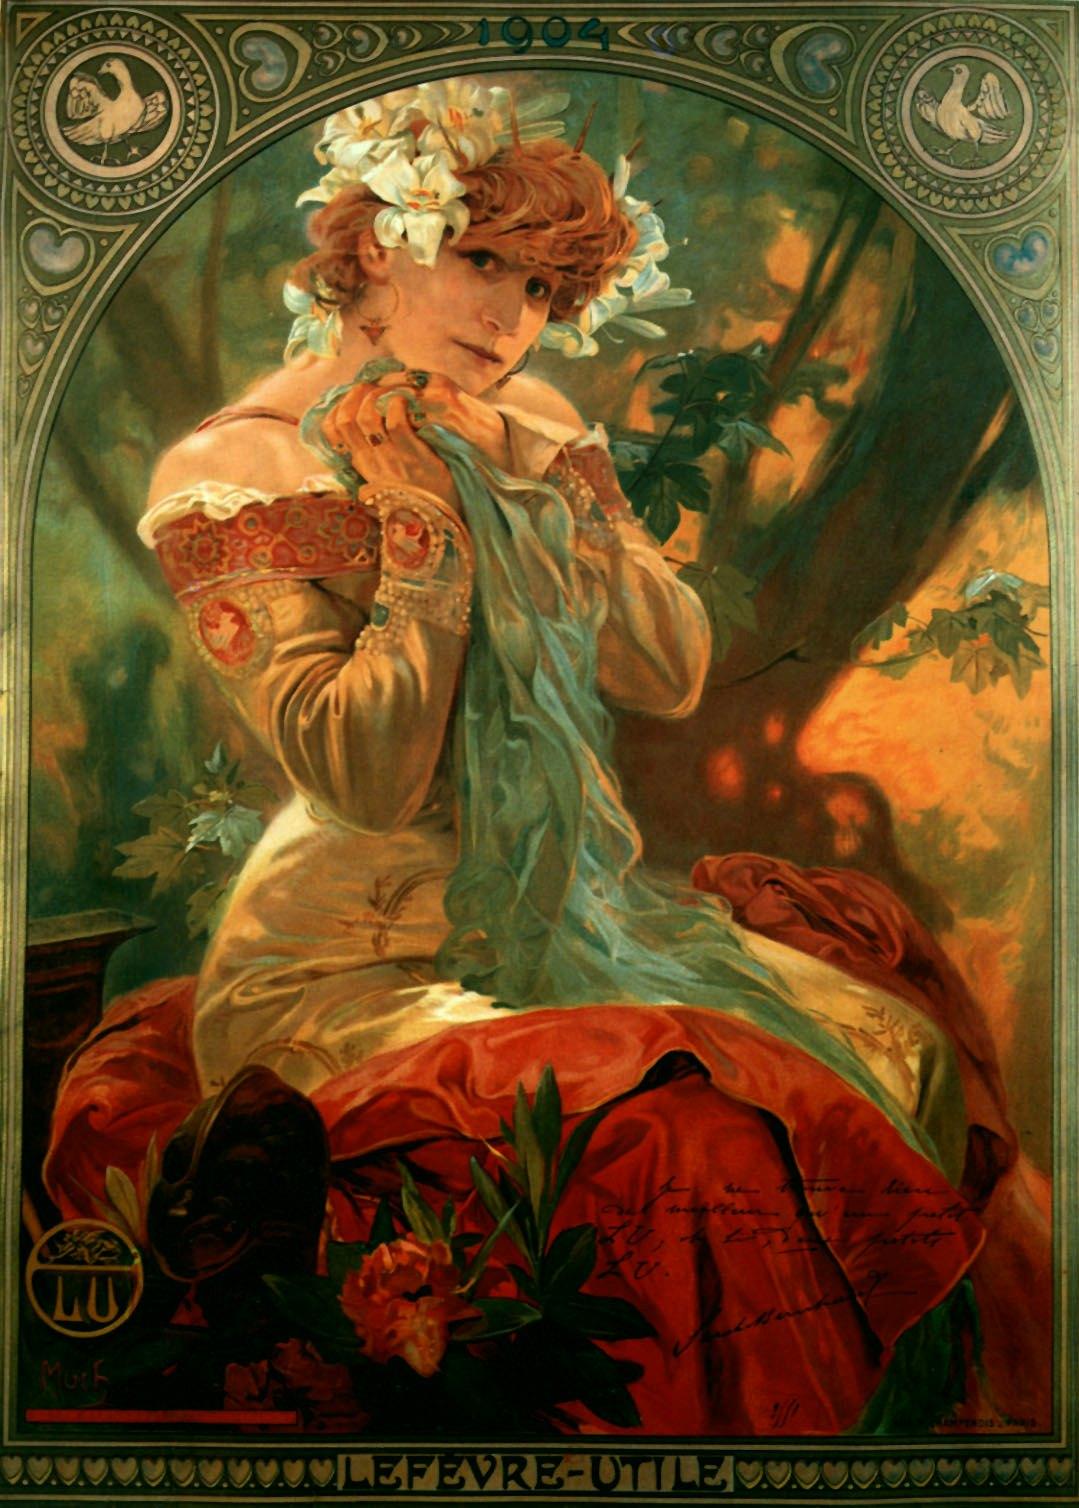 Рекламные плакаты Lefevre Utile-1903